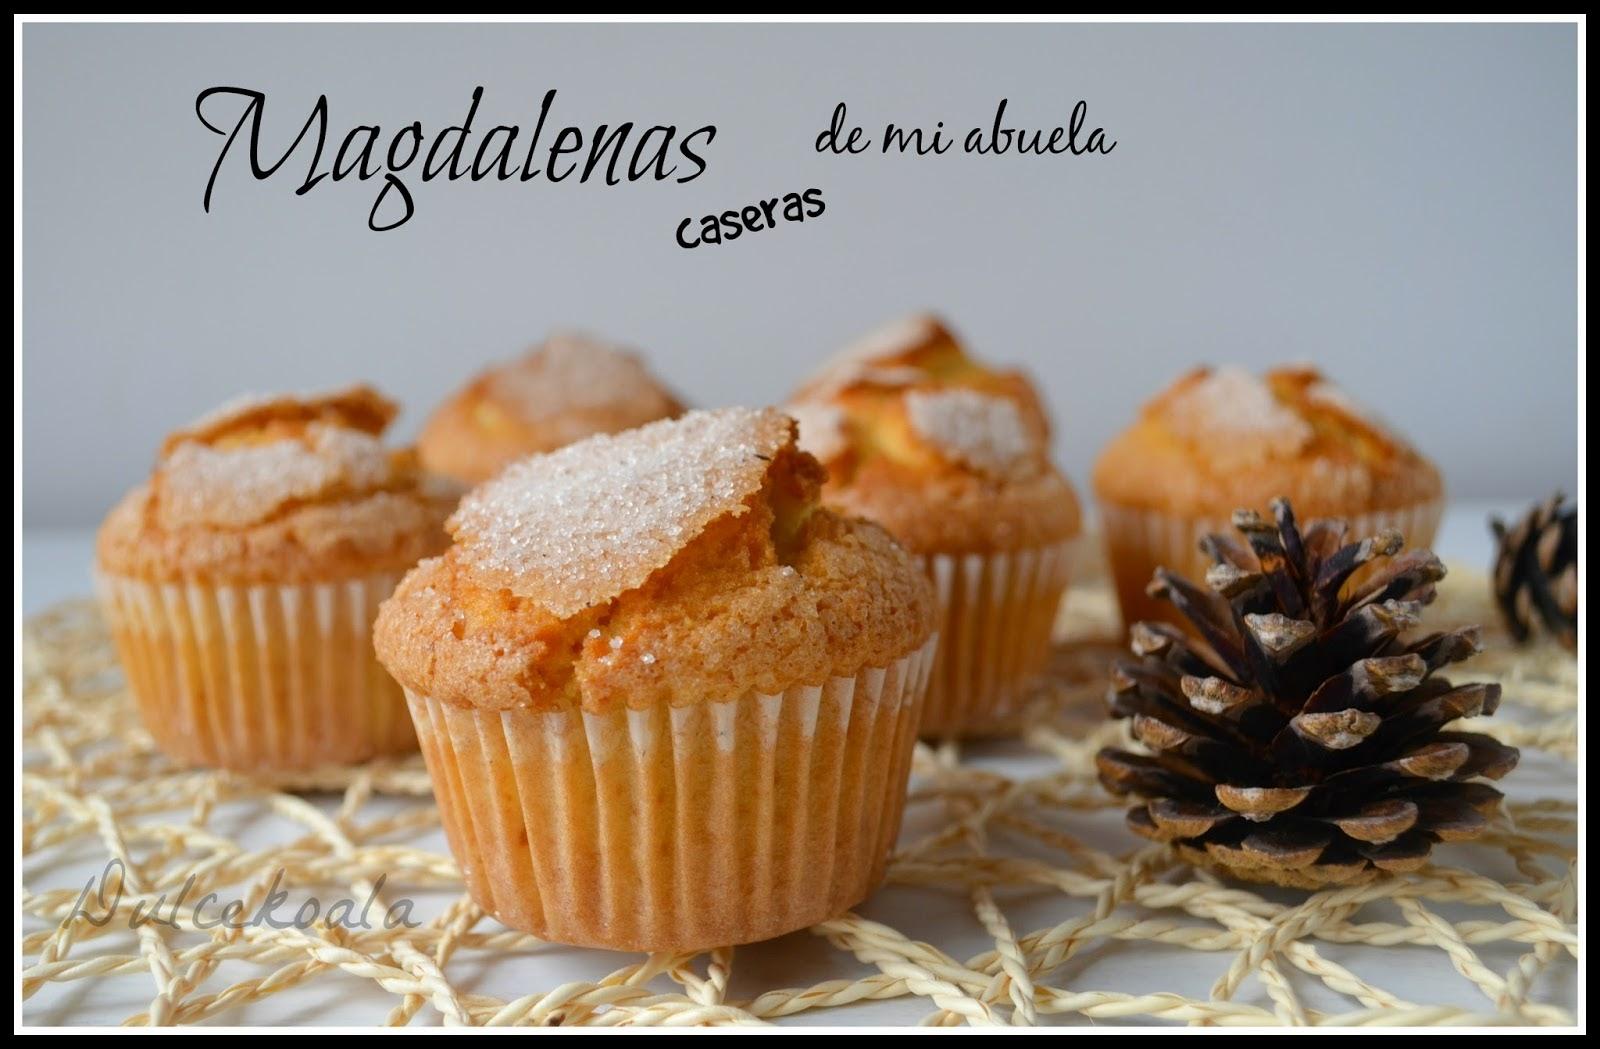 http://dulcekoala.blogspot.com.es/2015/01/magdalenas-caseras-de-mi-abuela.html